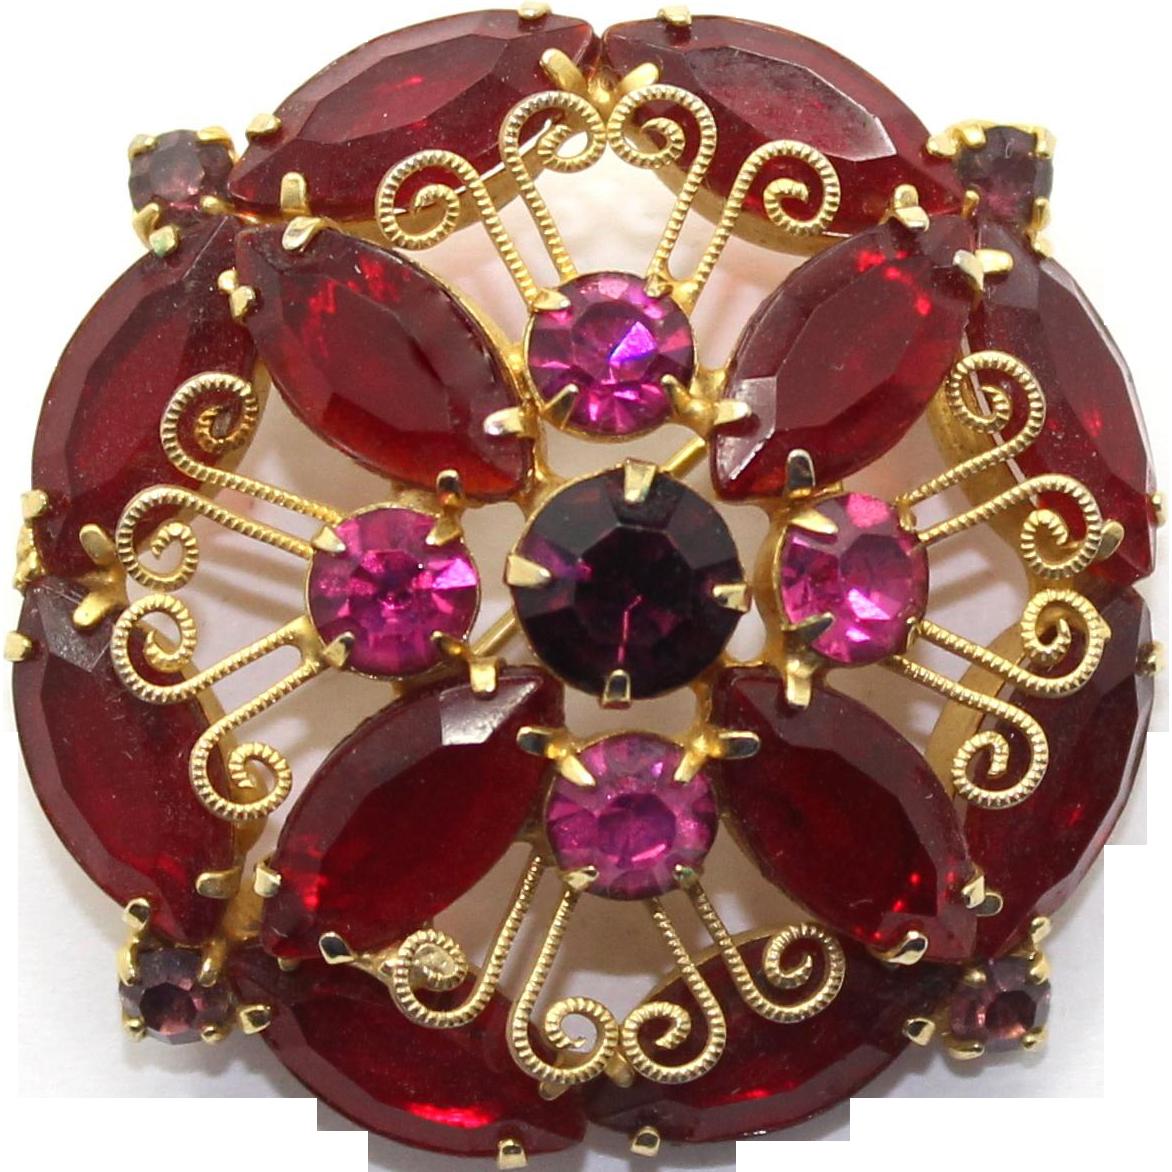 Vintage Juliana Red, Fuchsia Pink Rhinestone S Scroll Brooch